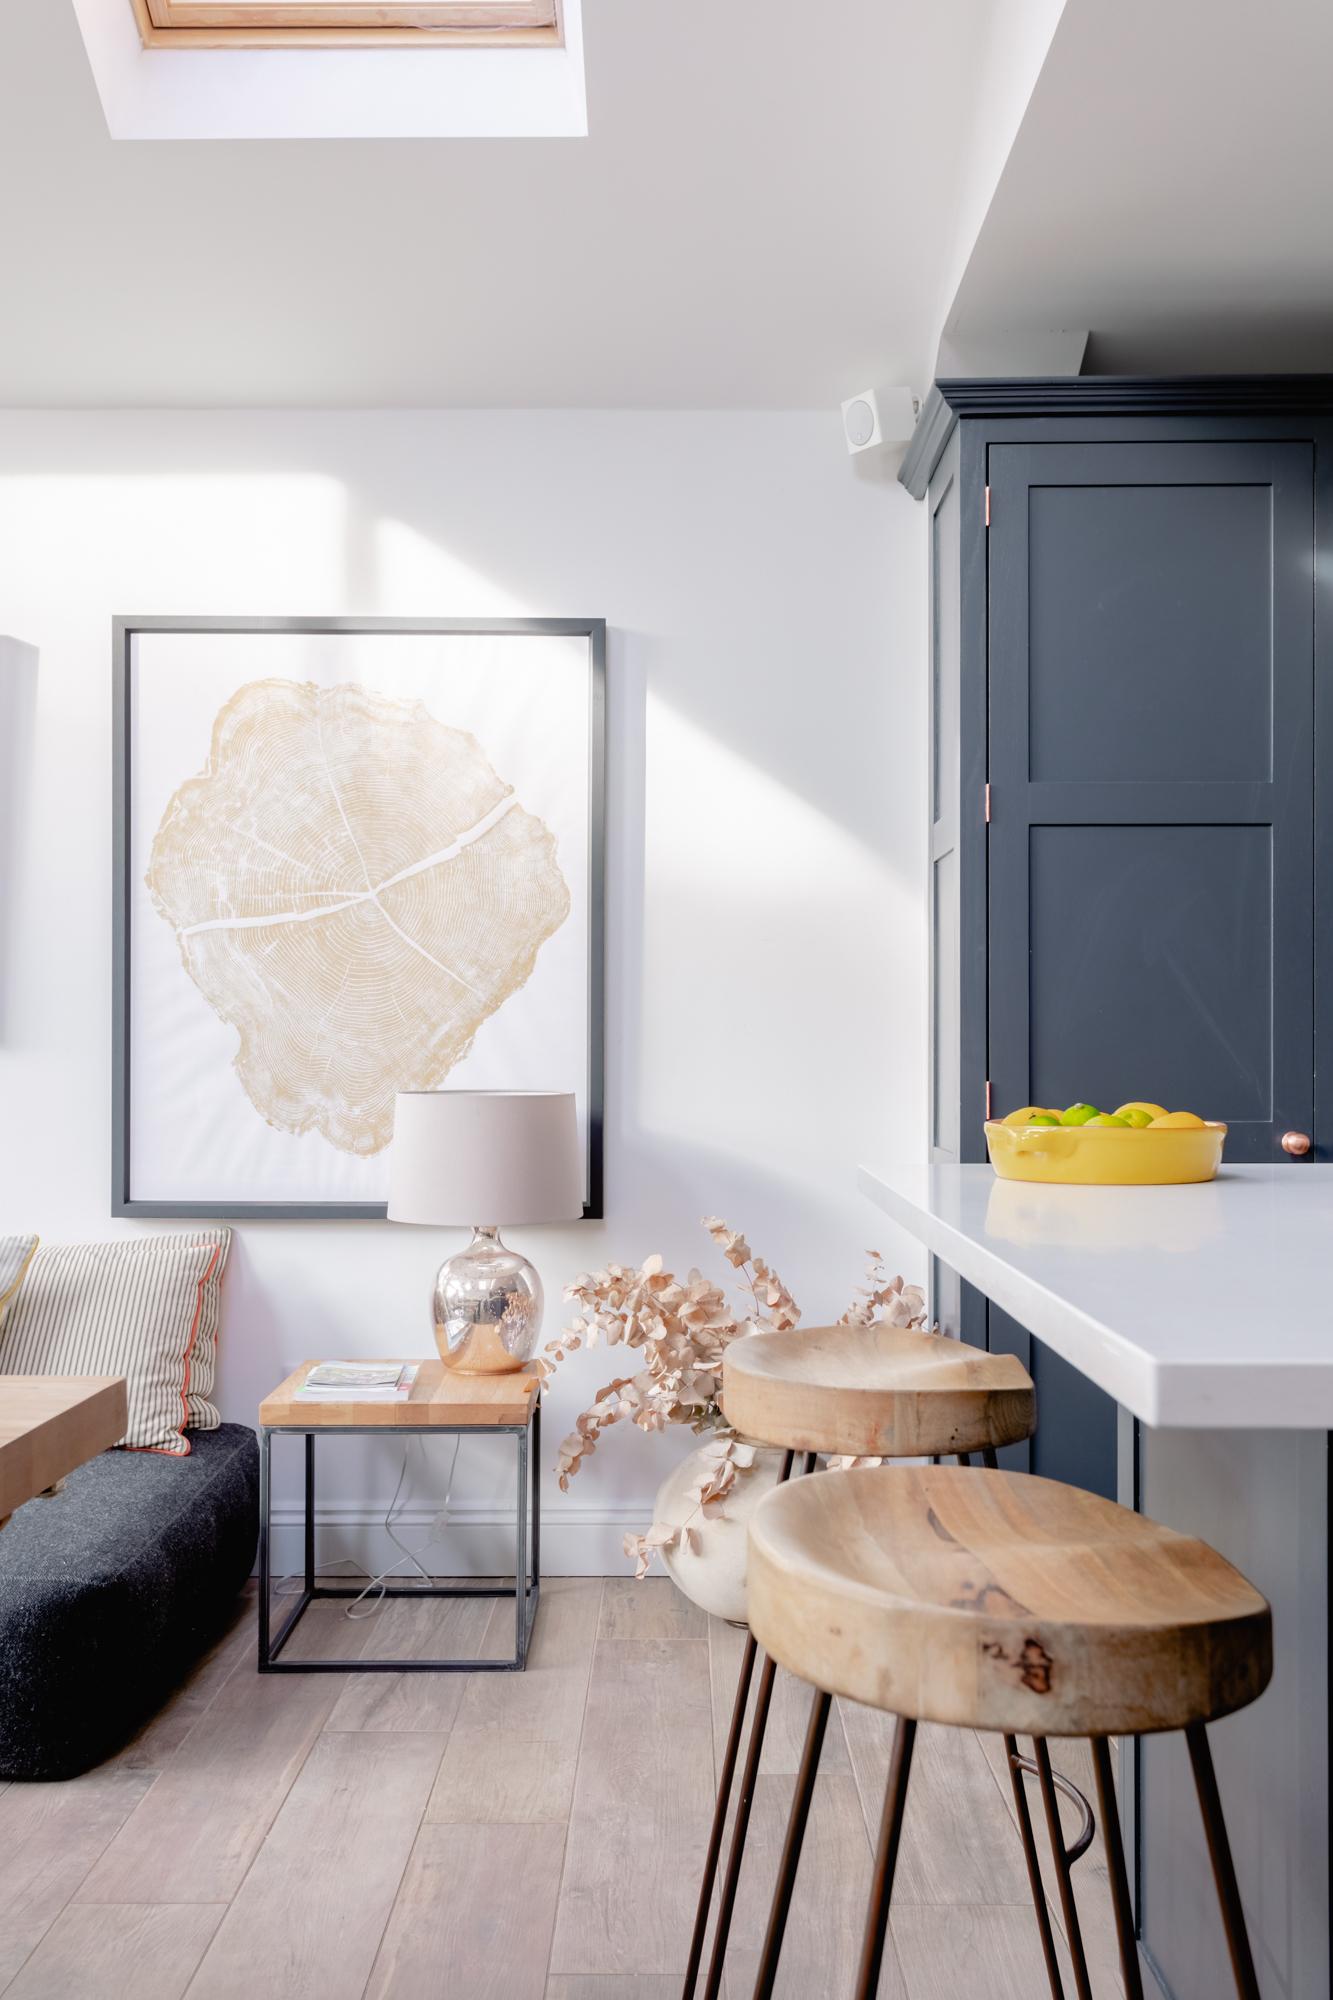 Interiors-3.jpg